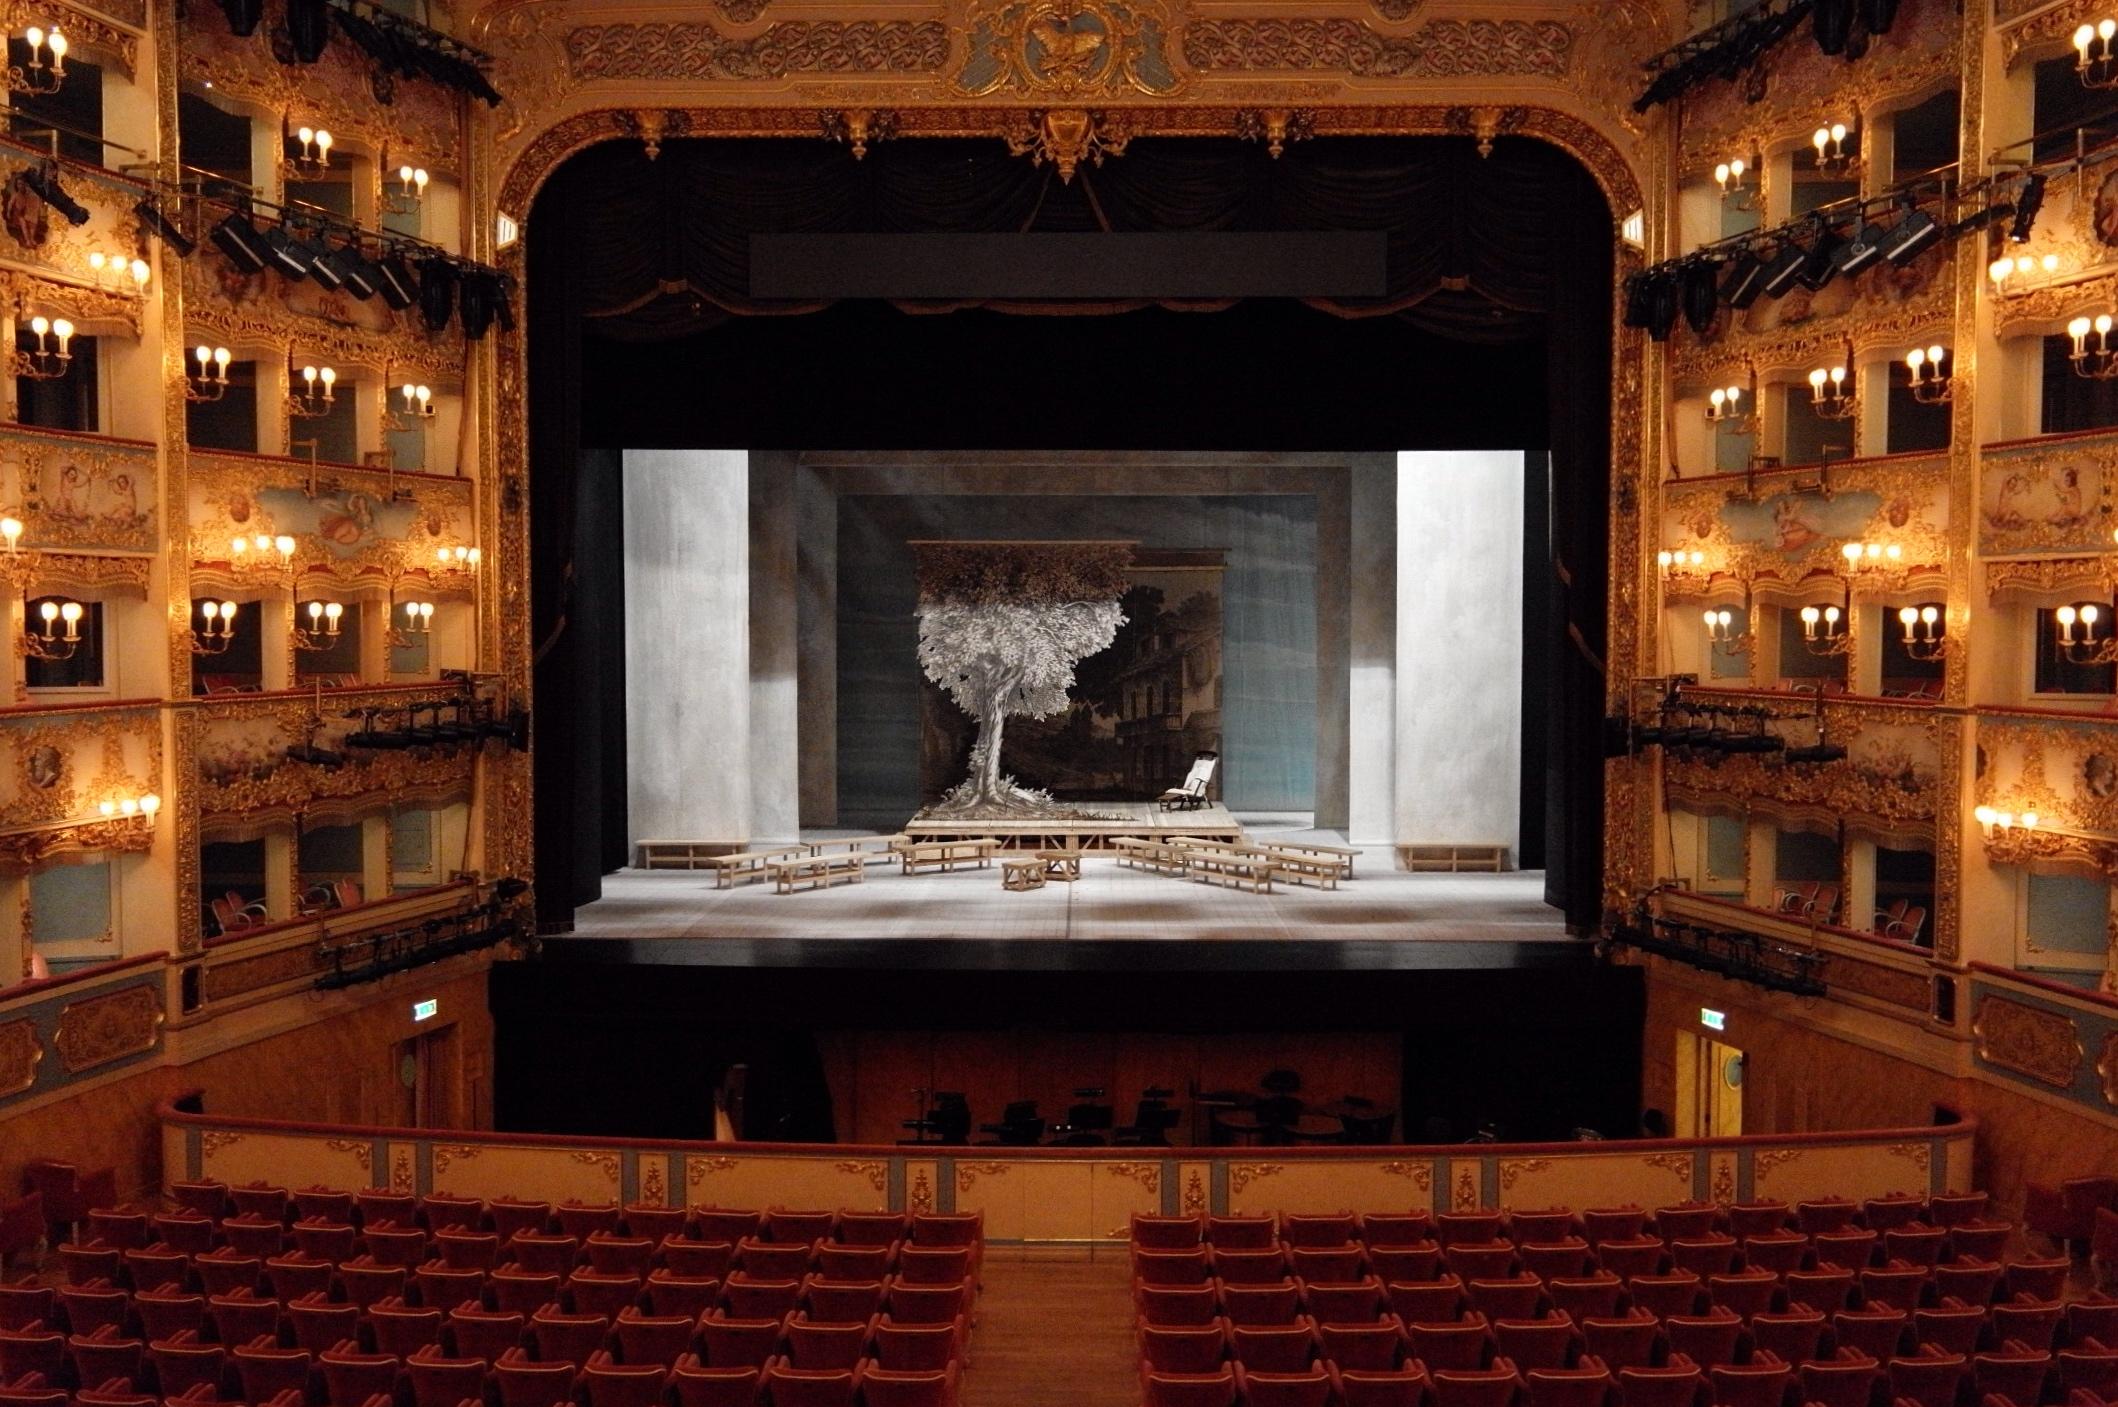 Teatro La Fenice - Venice